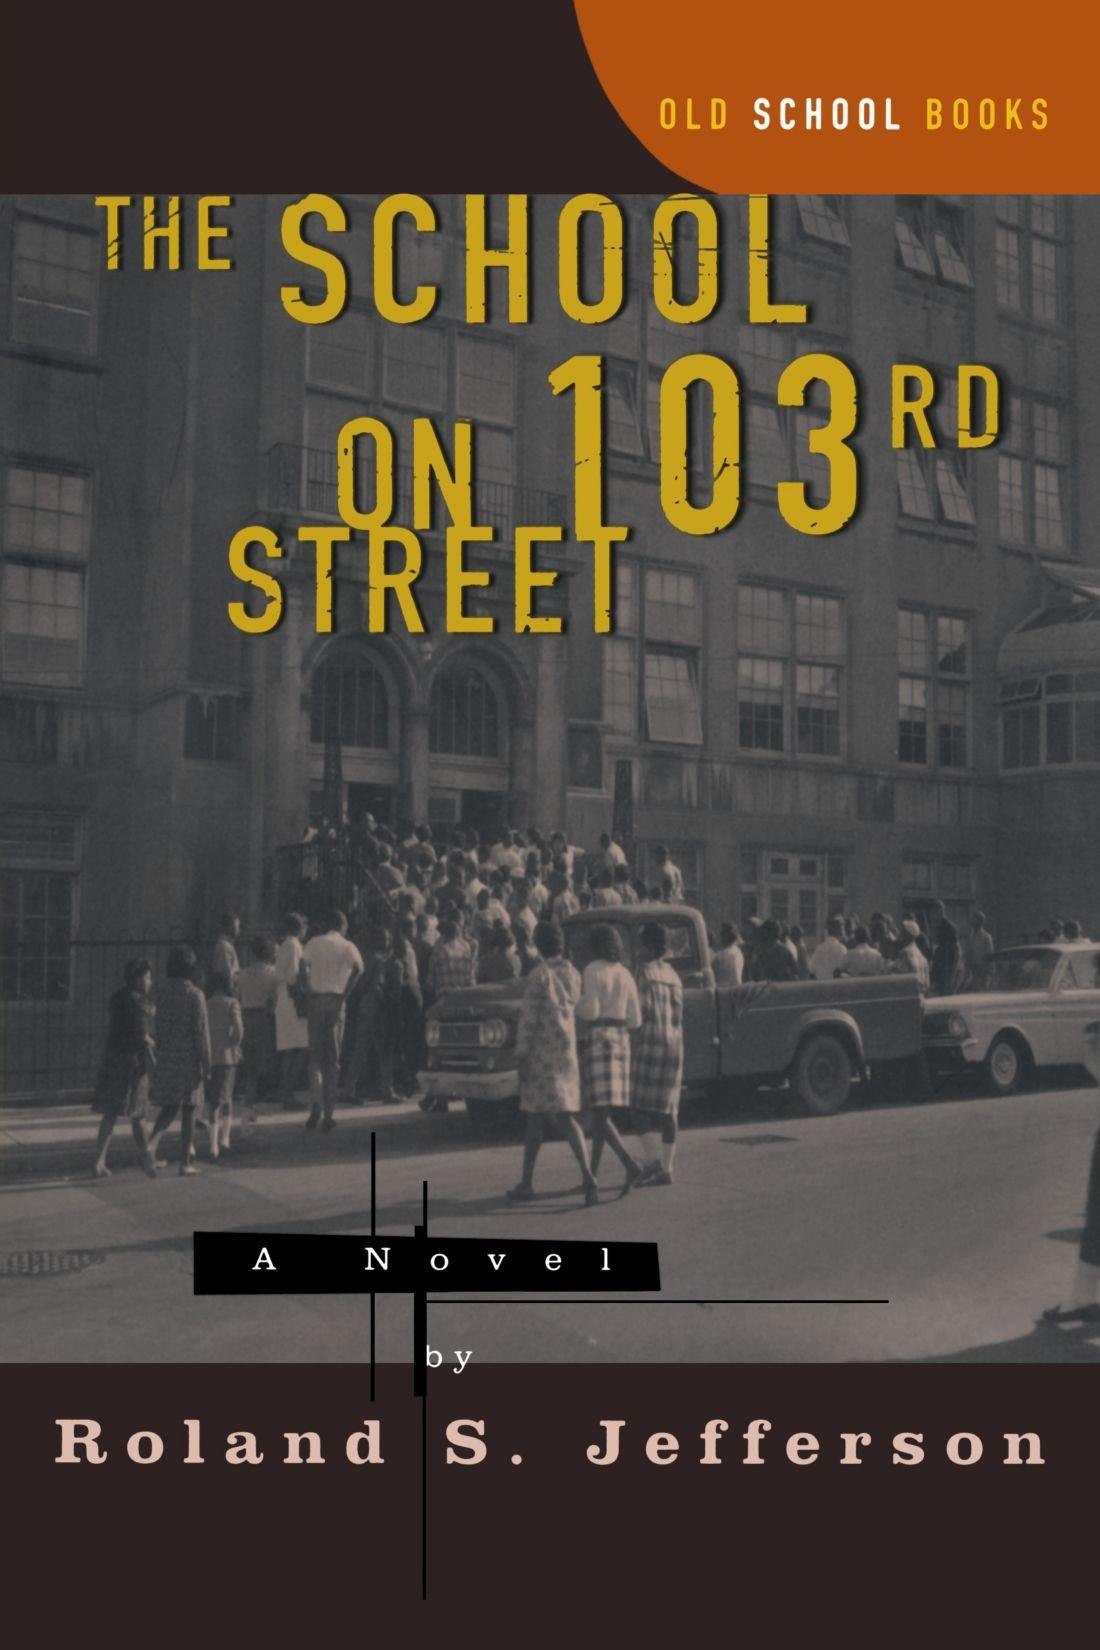 The School On 103rd Street: A Novel (old School Books): Roland S  Jefferson: 9780393316629: Amazon: Books